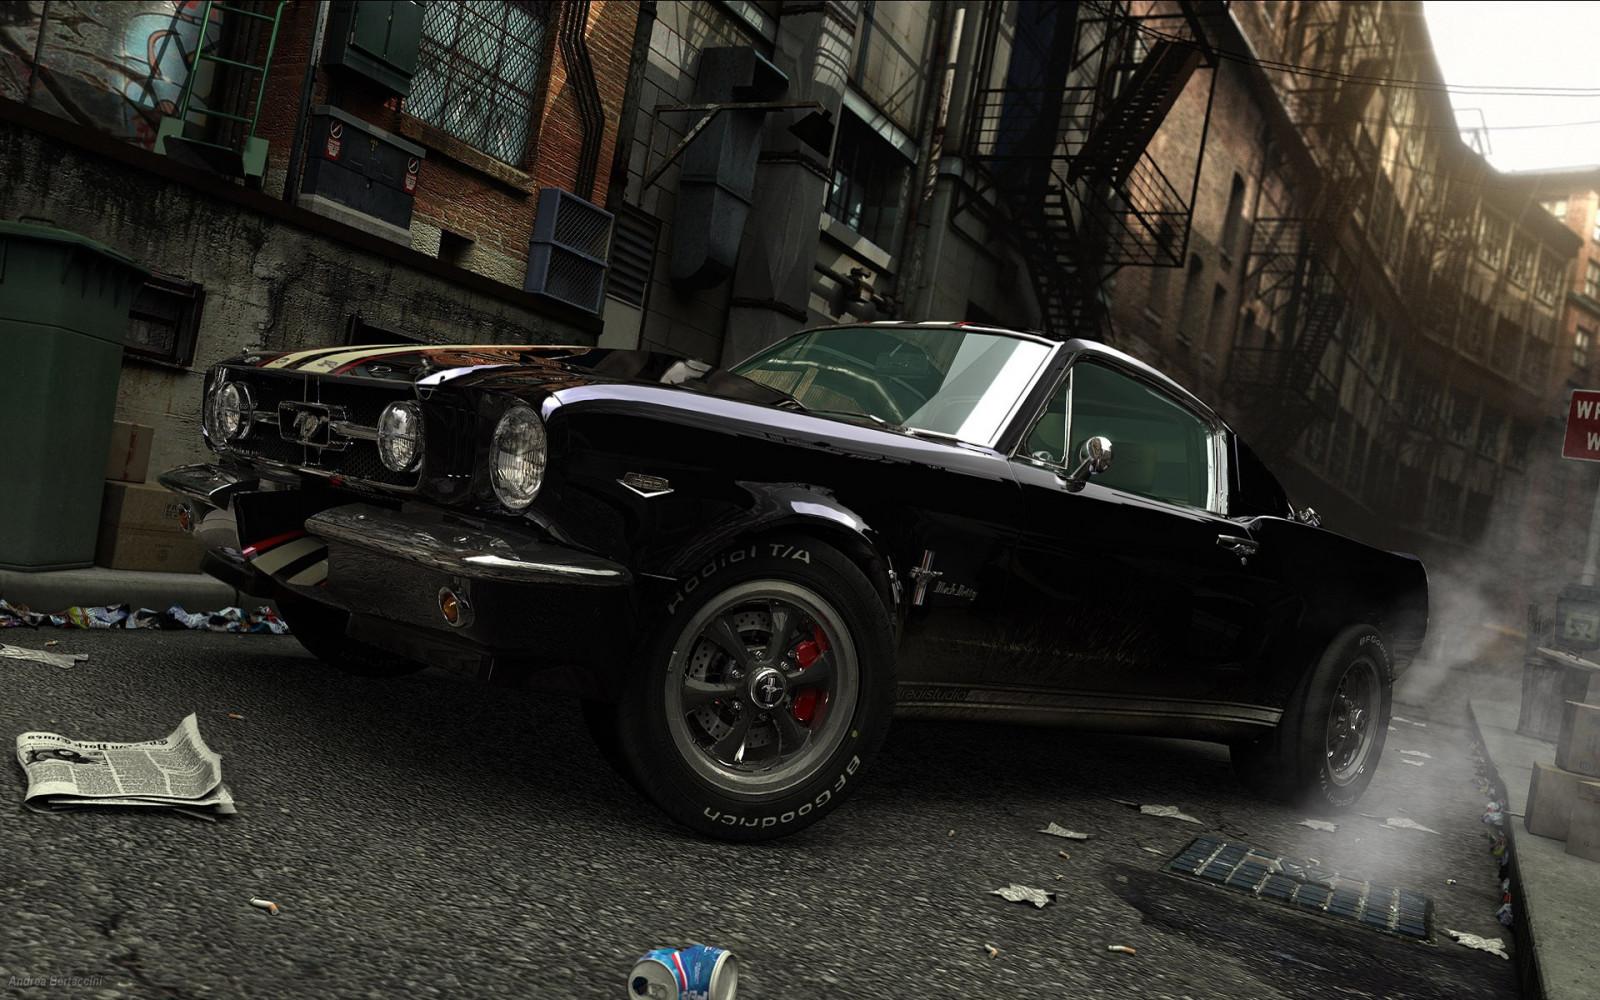 Wallpaper : street, Ford Mustang, black cars, sports car ...